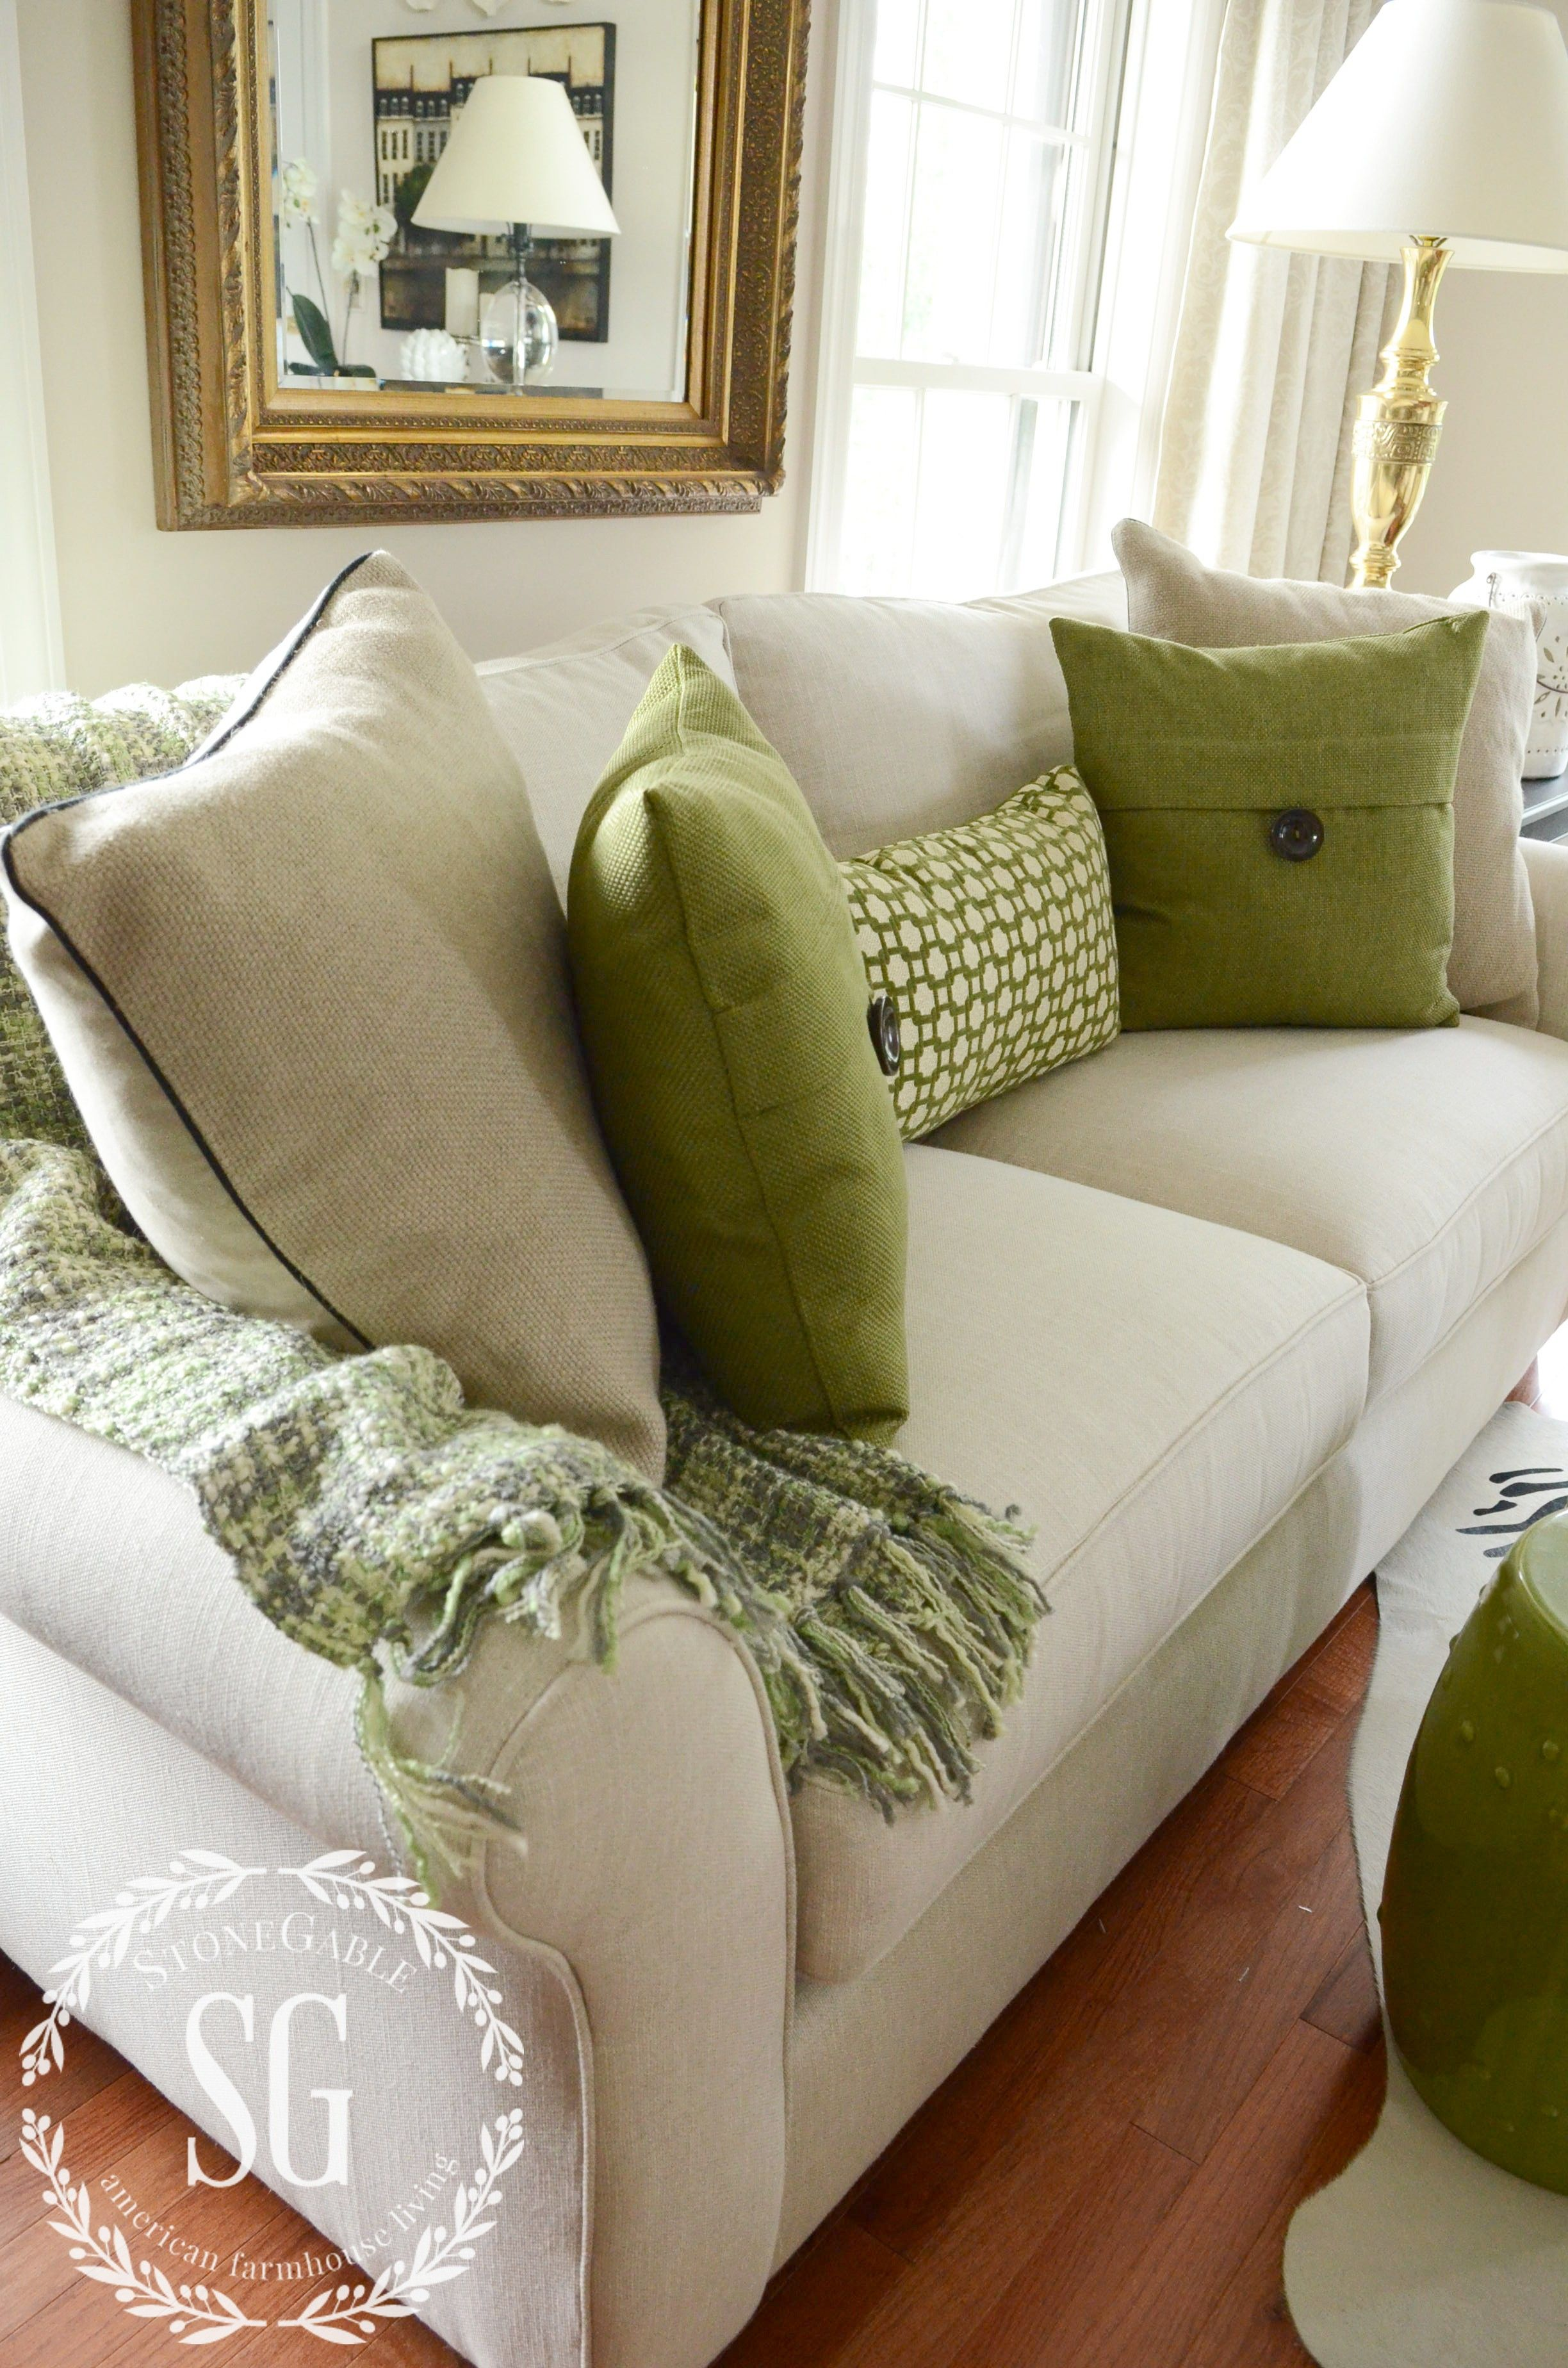 5 NO FAIL TIPS FOR ARRANGING PILLOWS  Home improvements